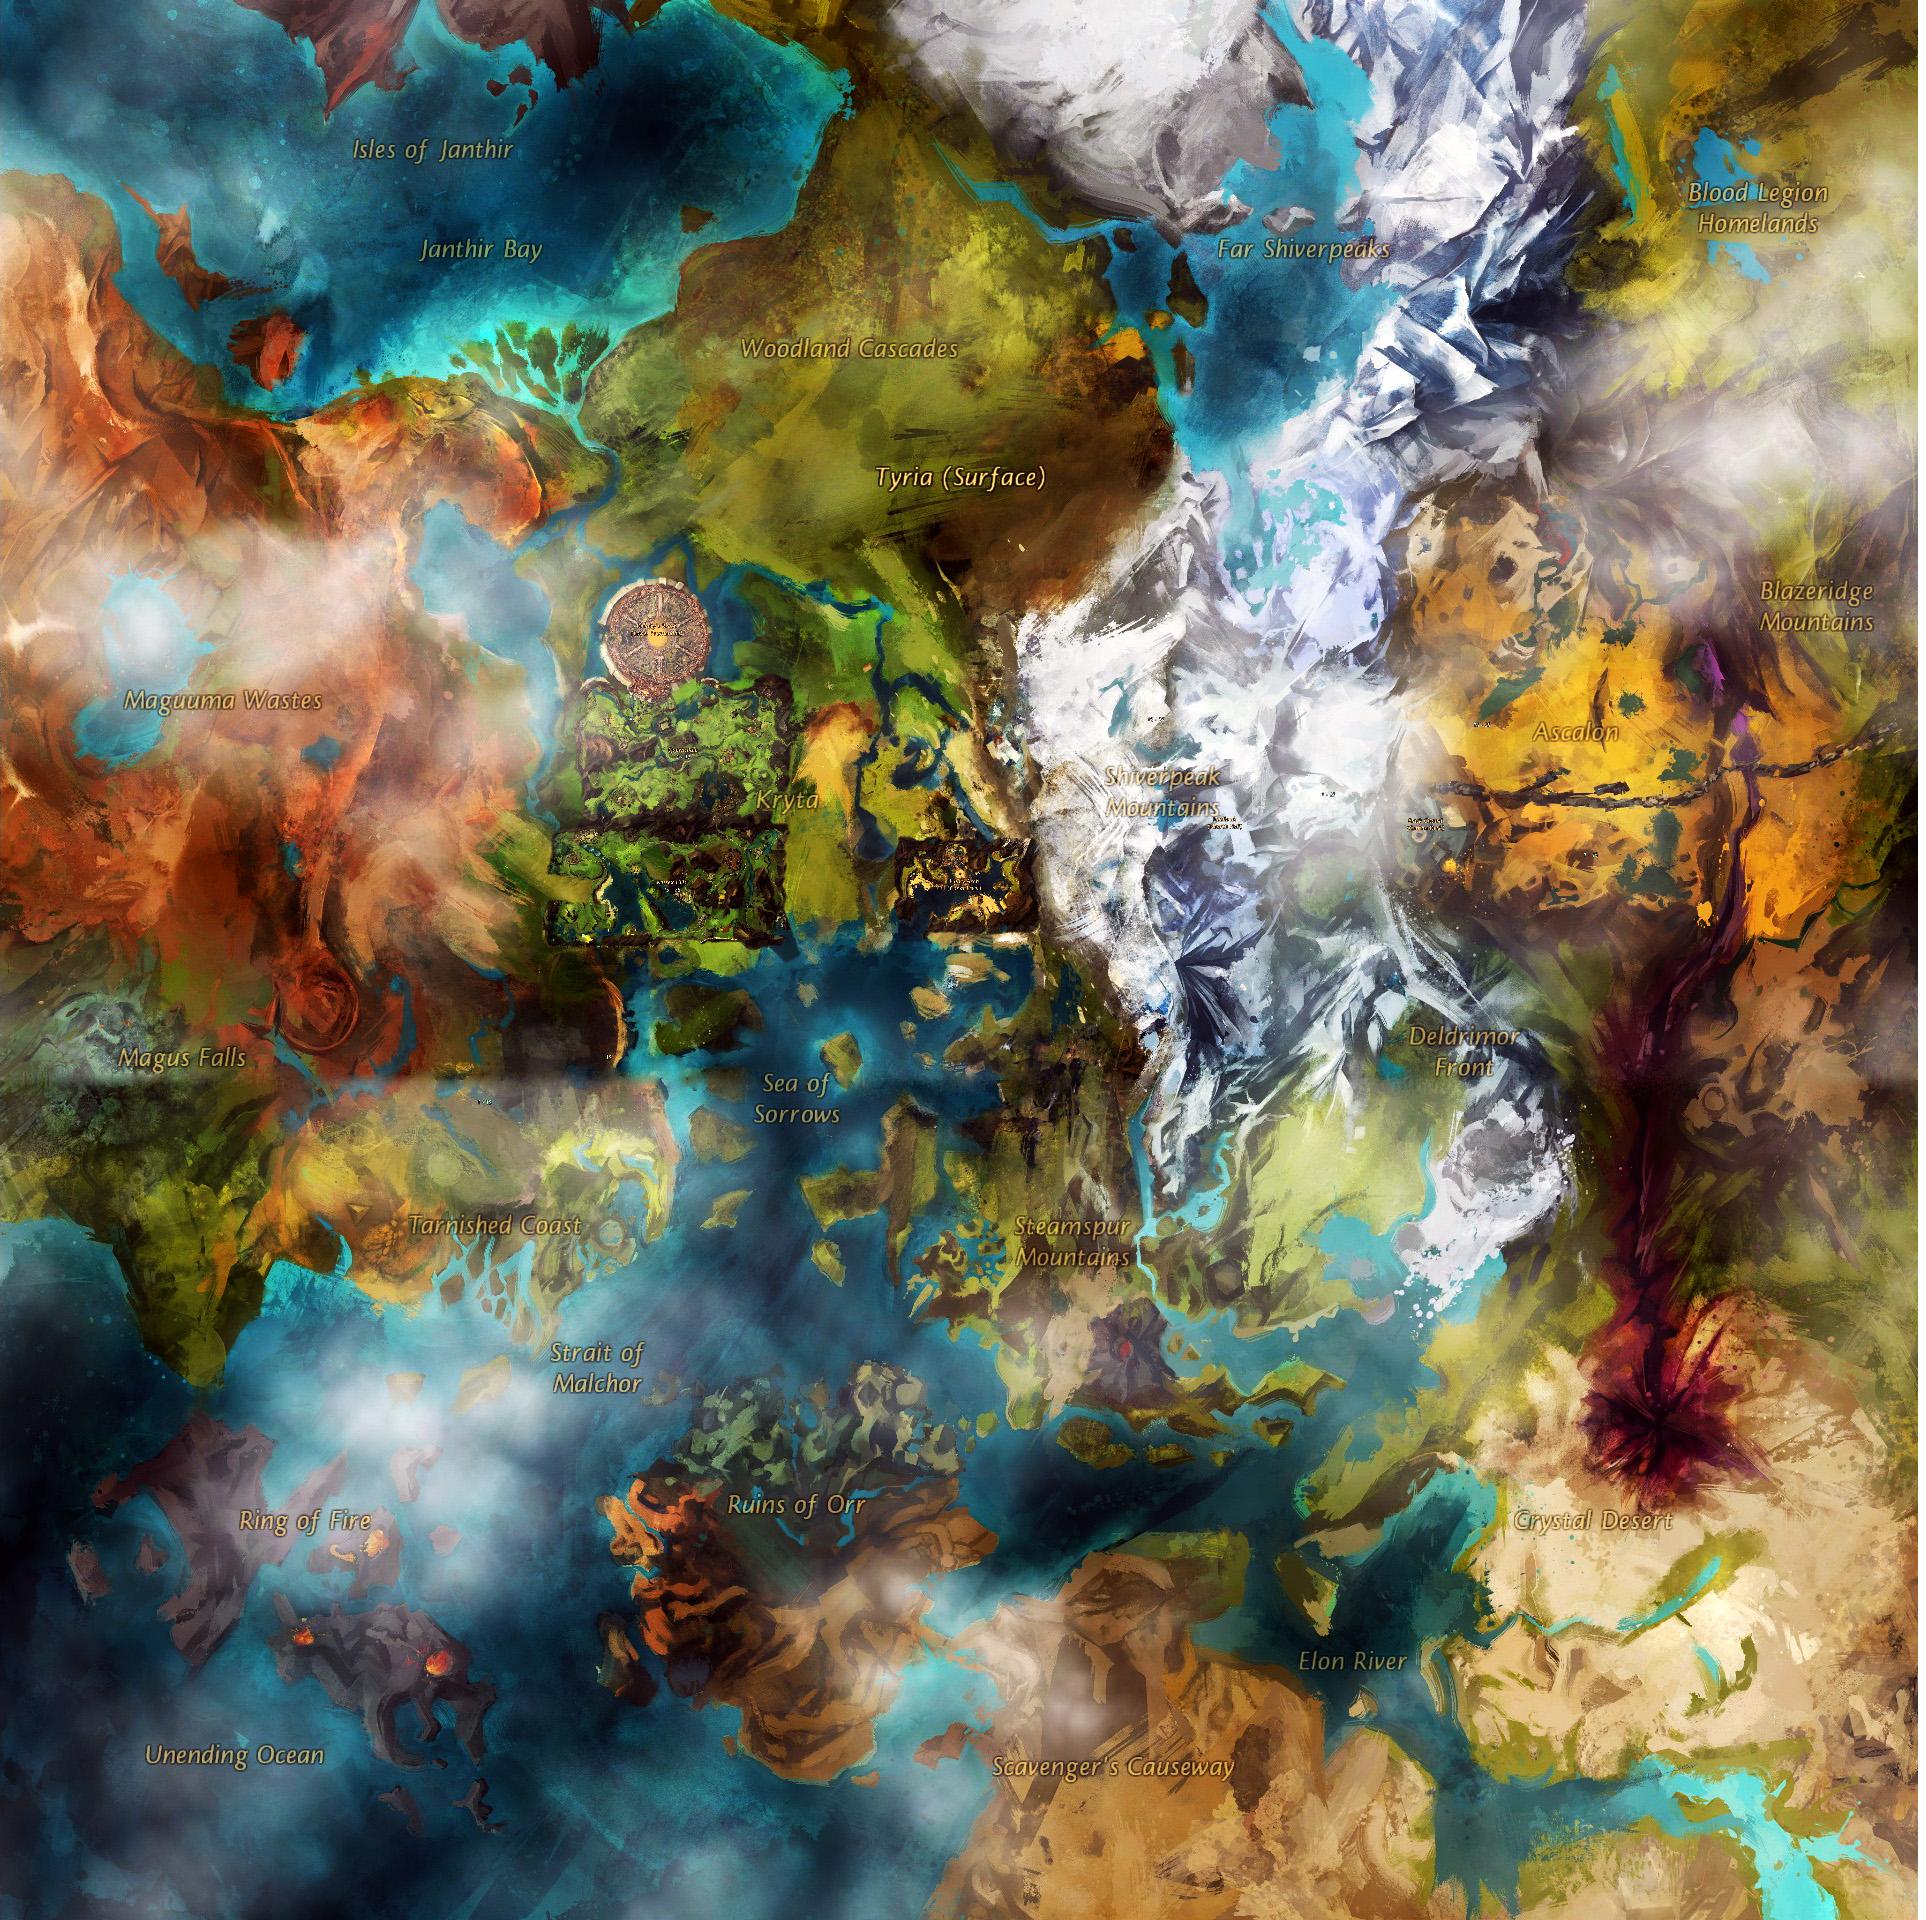 Guild Wars 2 World Map by Bhaal5001 on DeviantArt